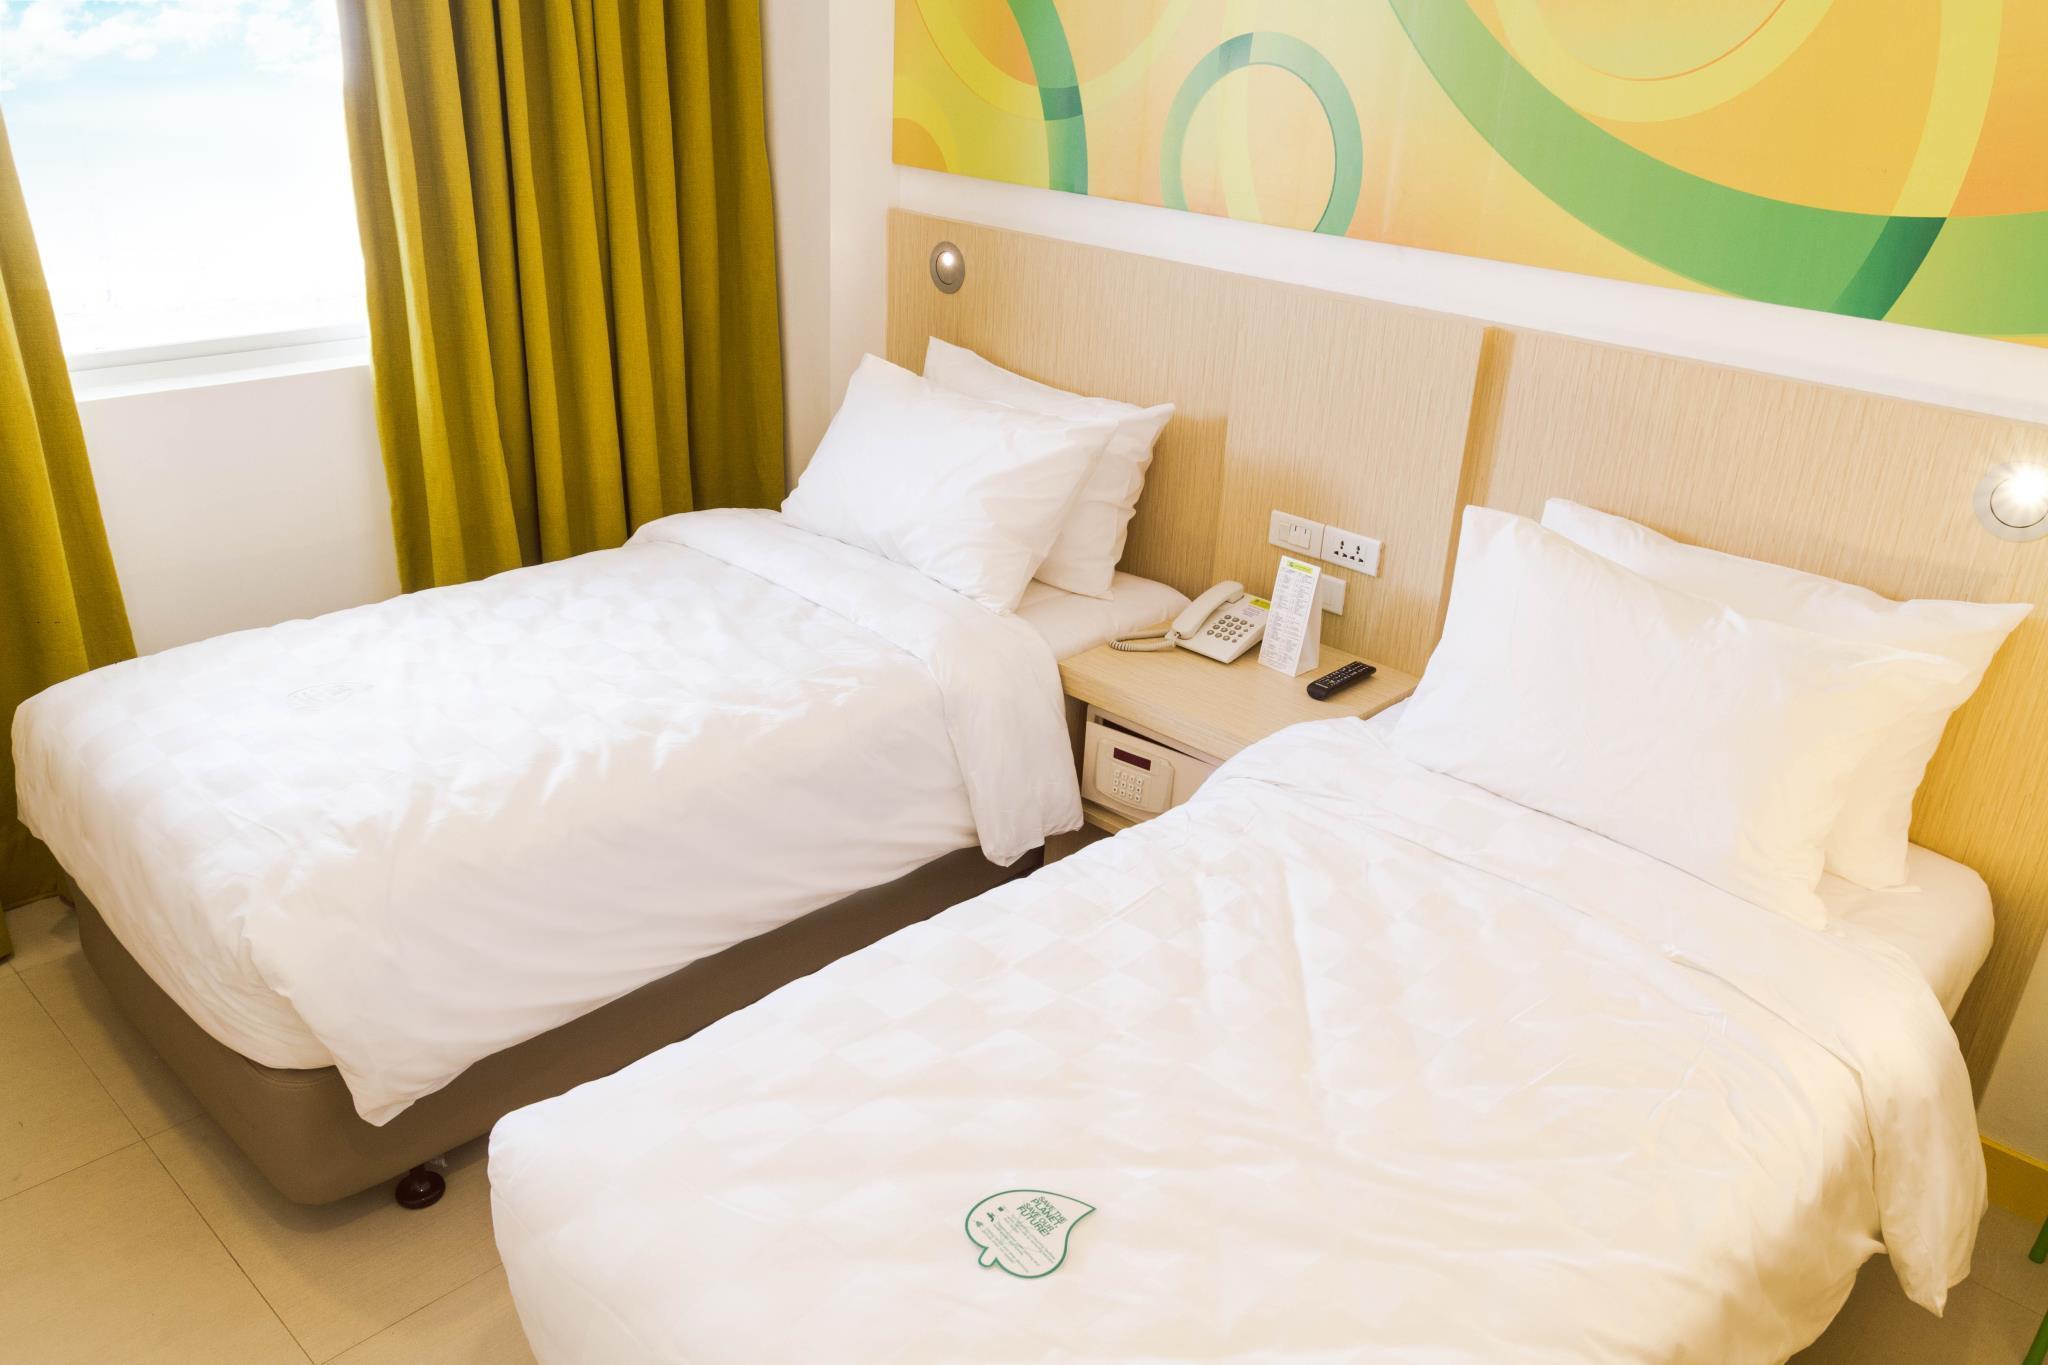 Go Hotels North Edsa